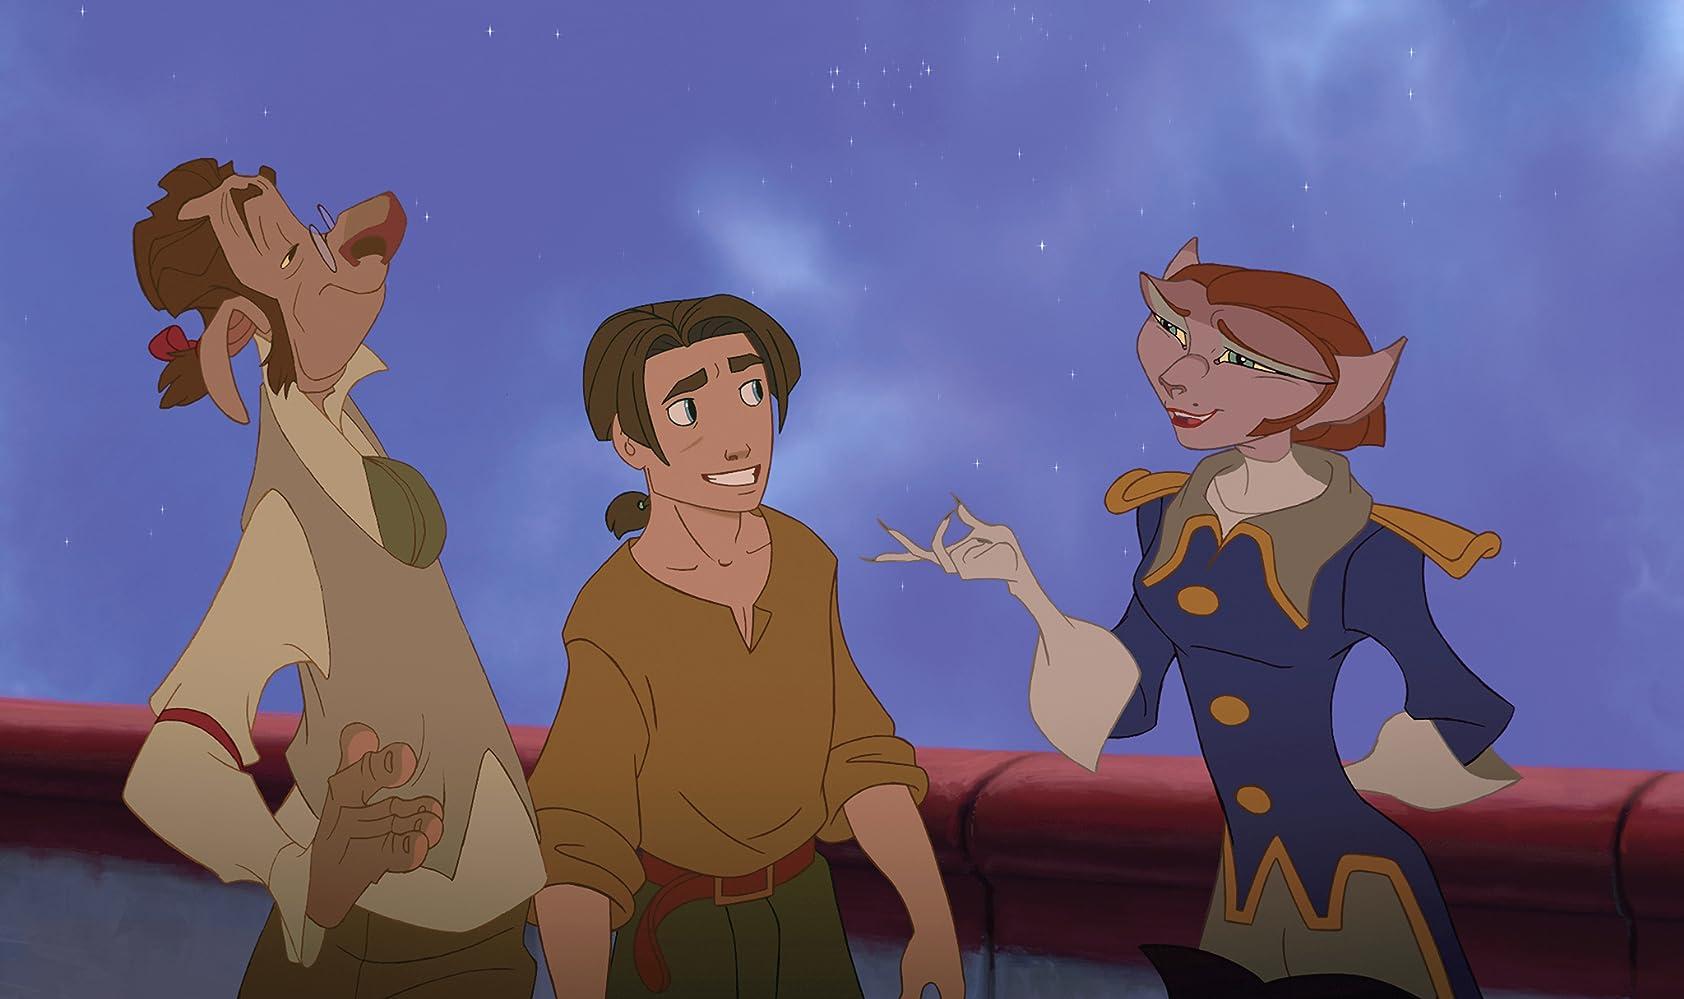 That Disney treasure planet dvd consider, that